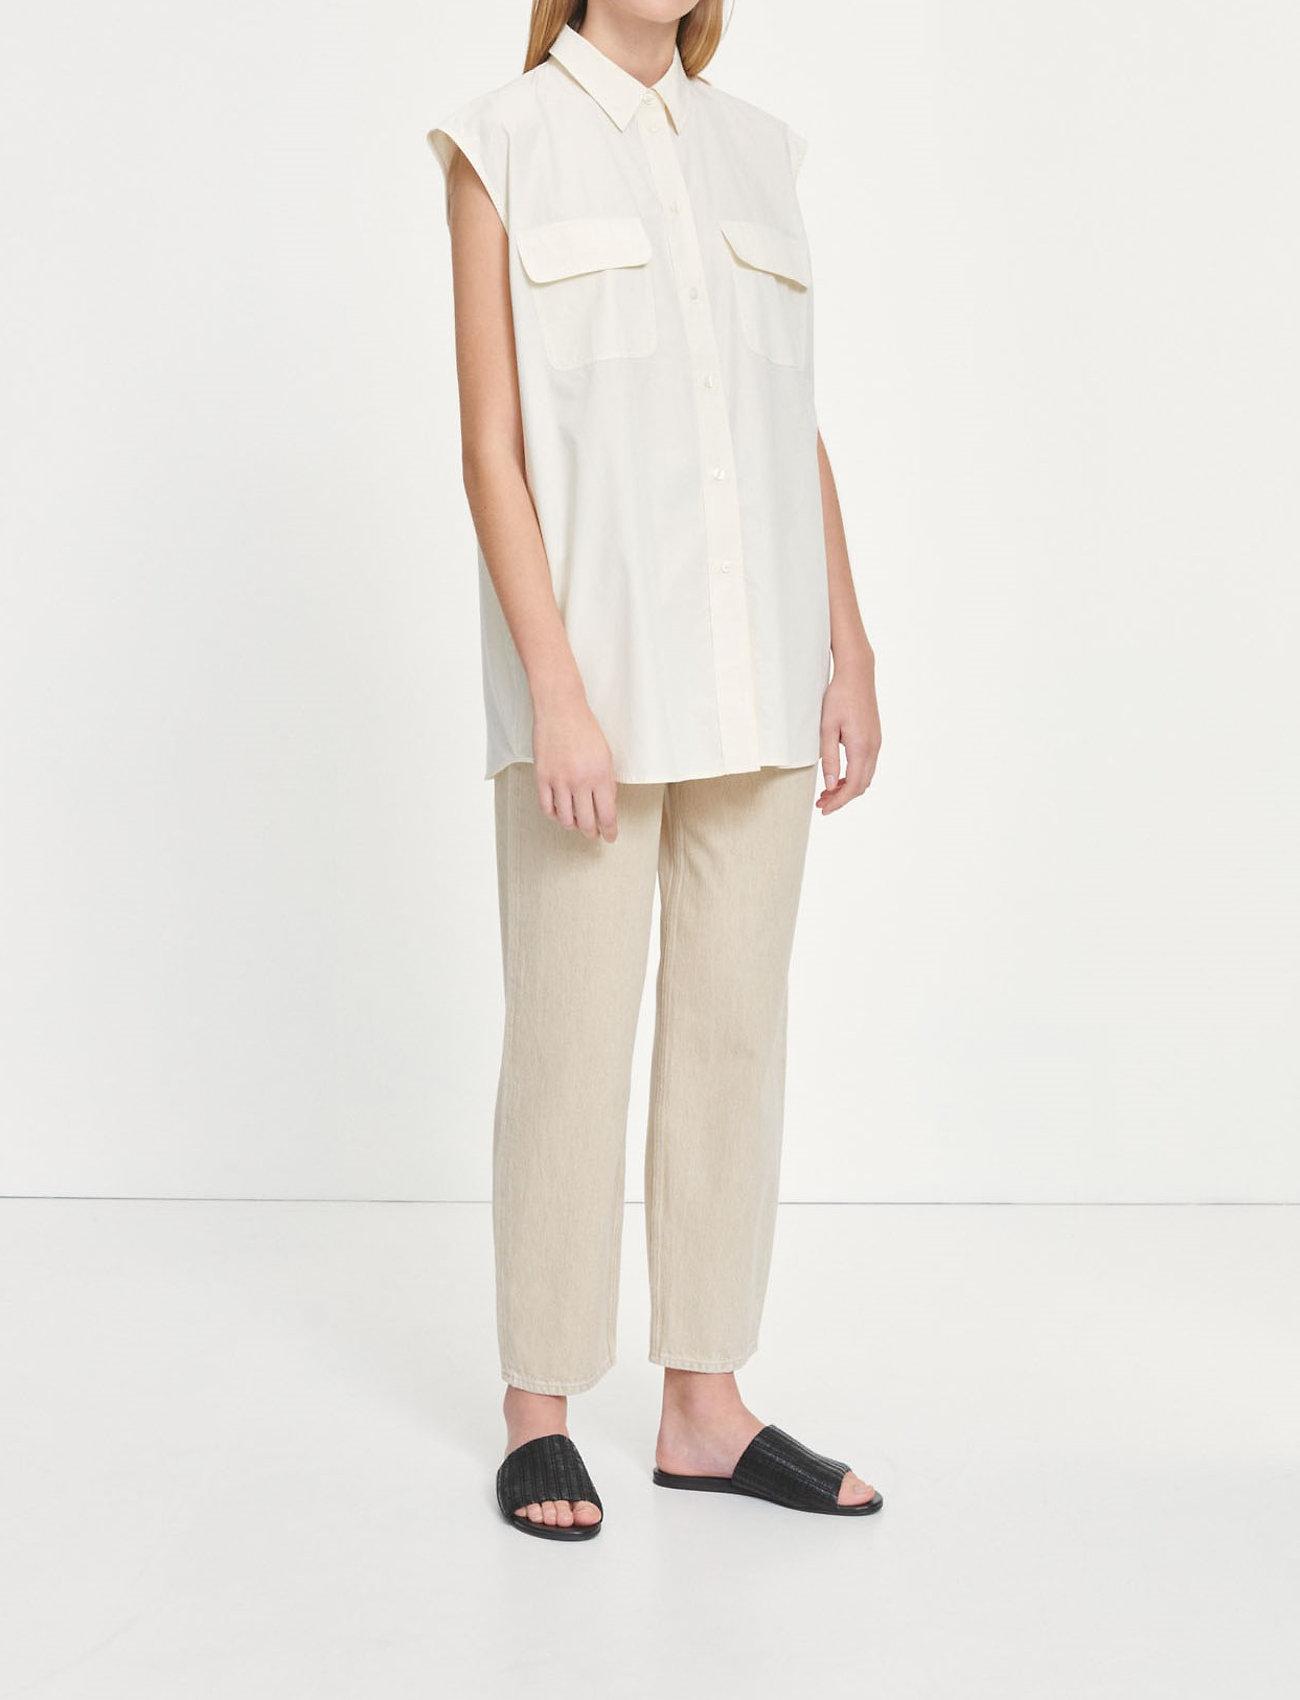 Samsøe Samsøe - Tea shirt top 11466 - denim shirts - antique white - 0